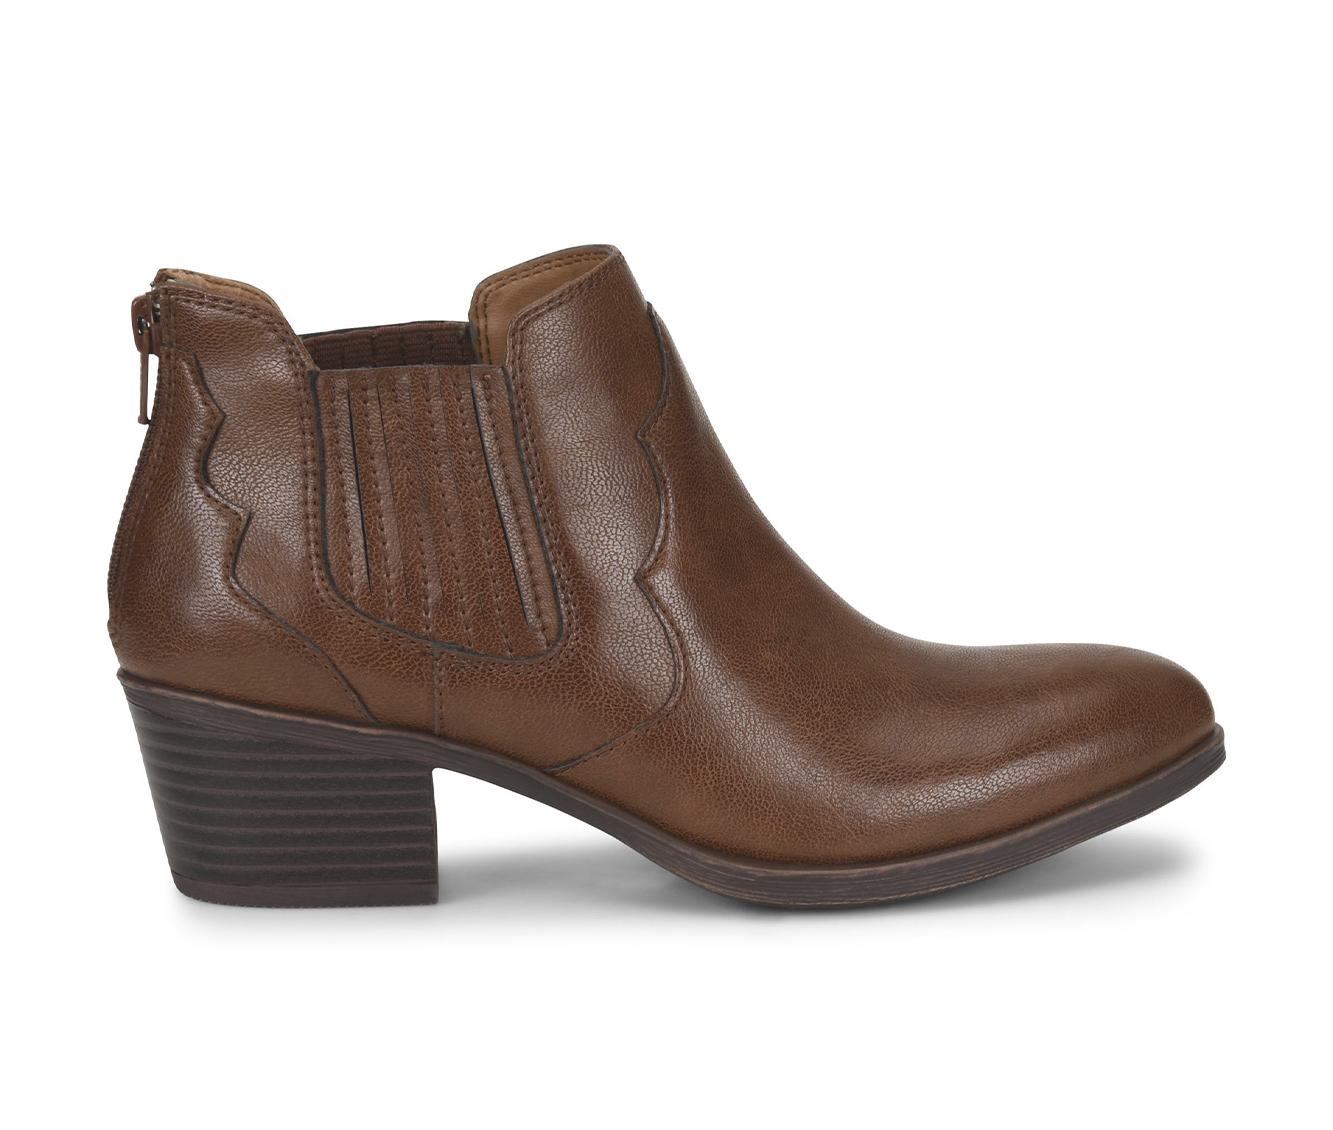 EuroSoft Adalene Women's Boots (Brown - Faux Leather)